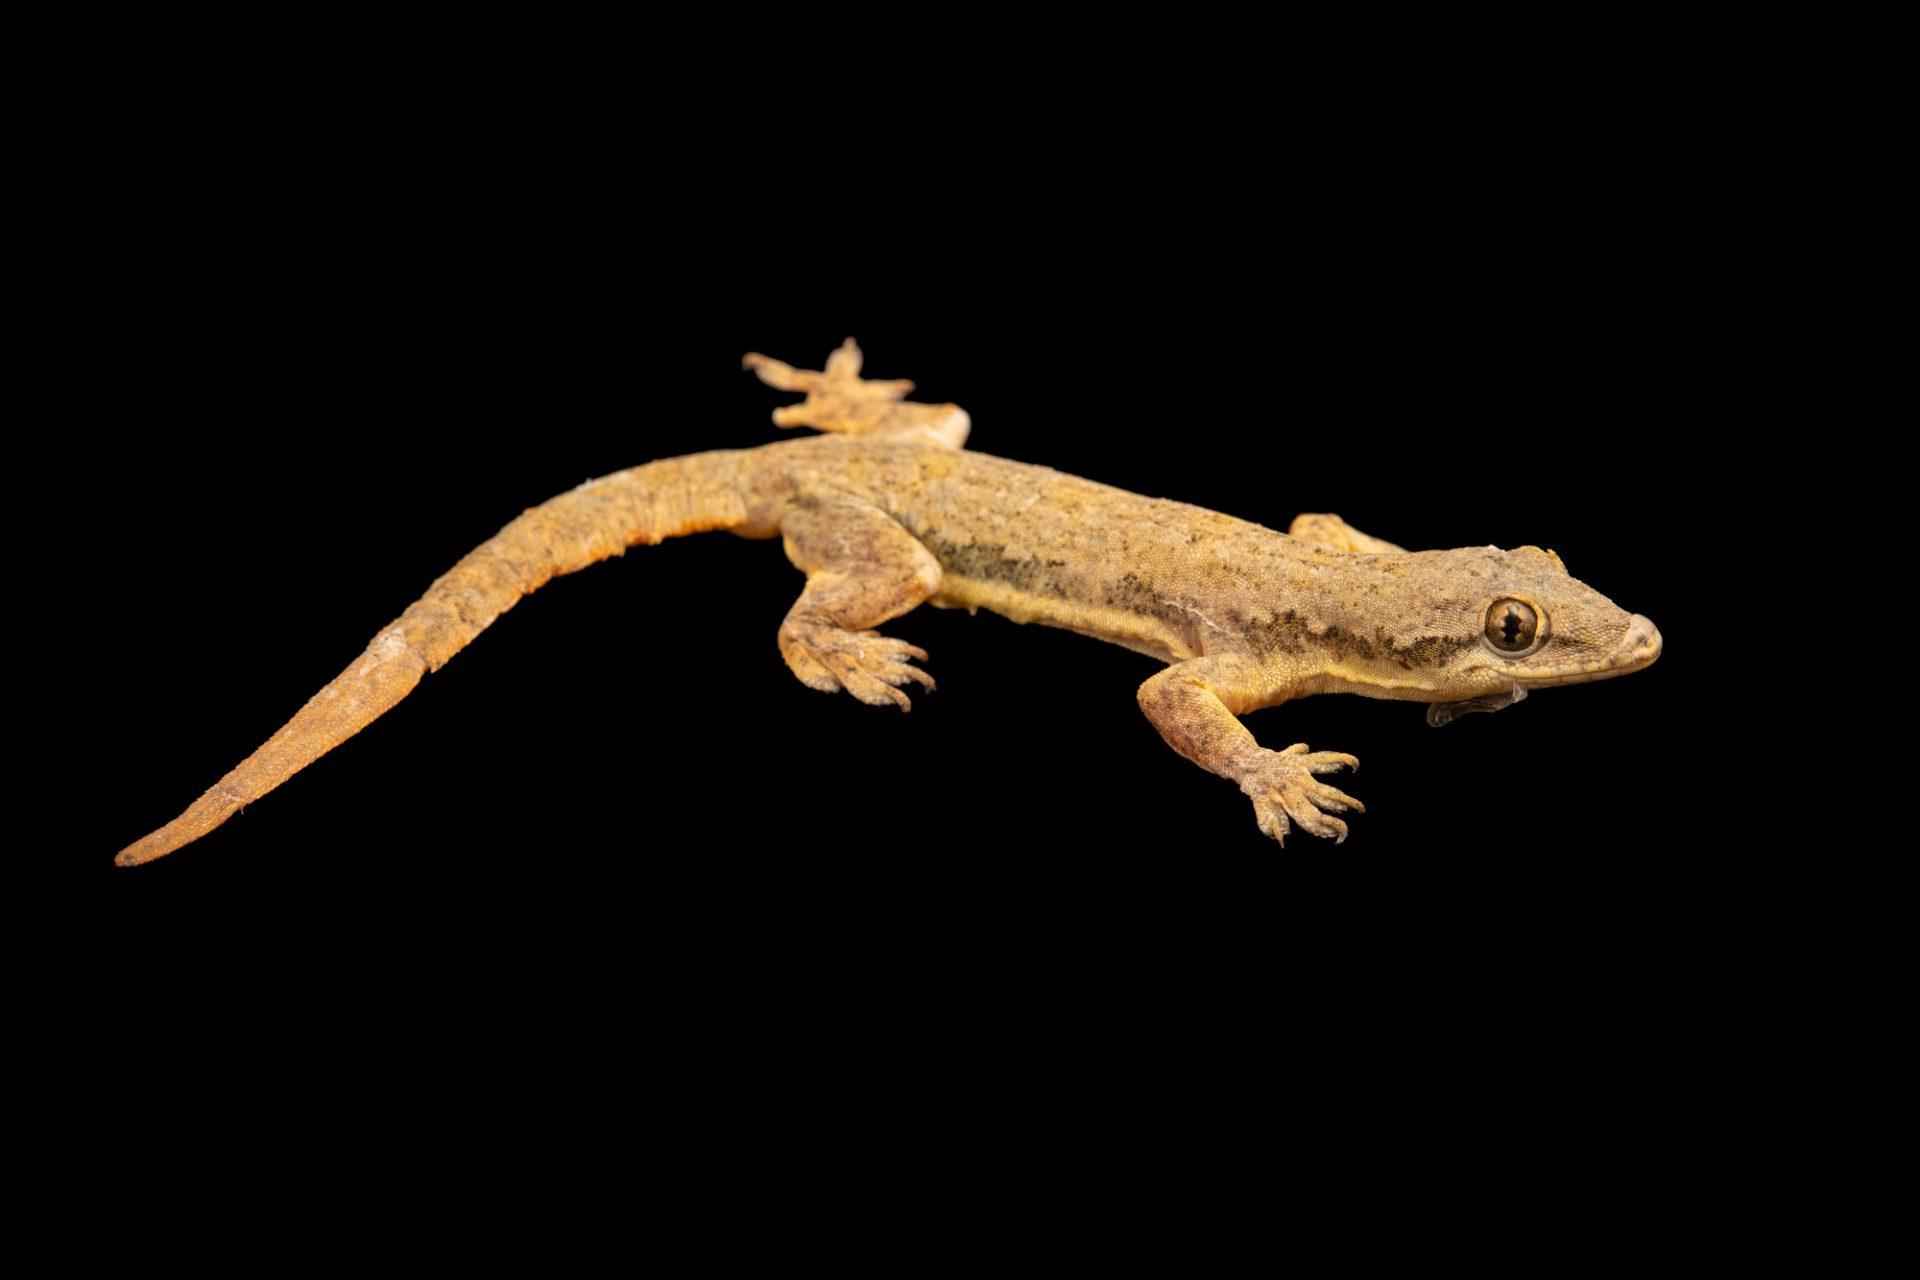 Photo: Frilled house gecko (Hemidactylus platyurus) at Crocolandia in the Philippines.